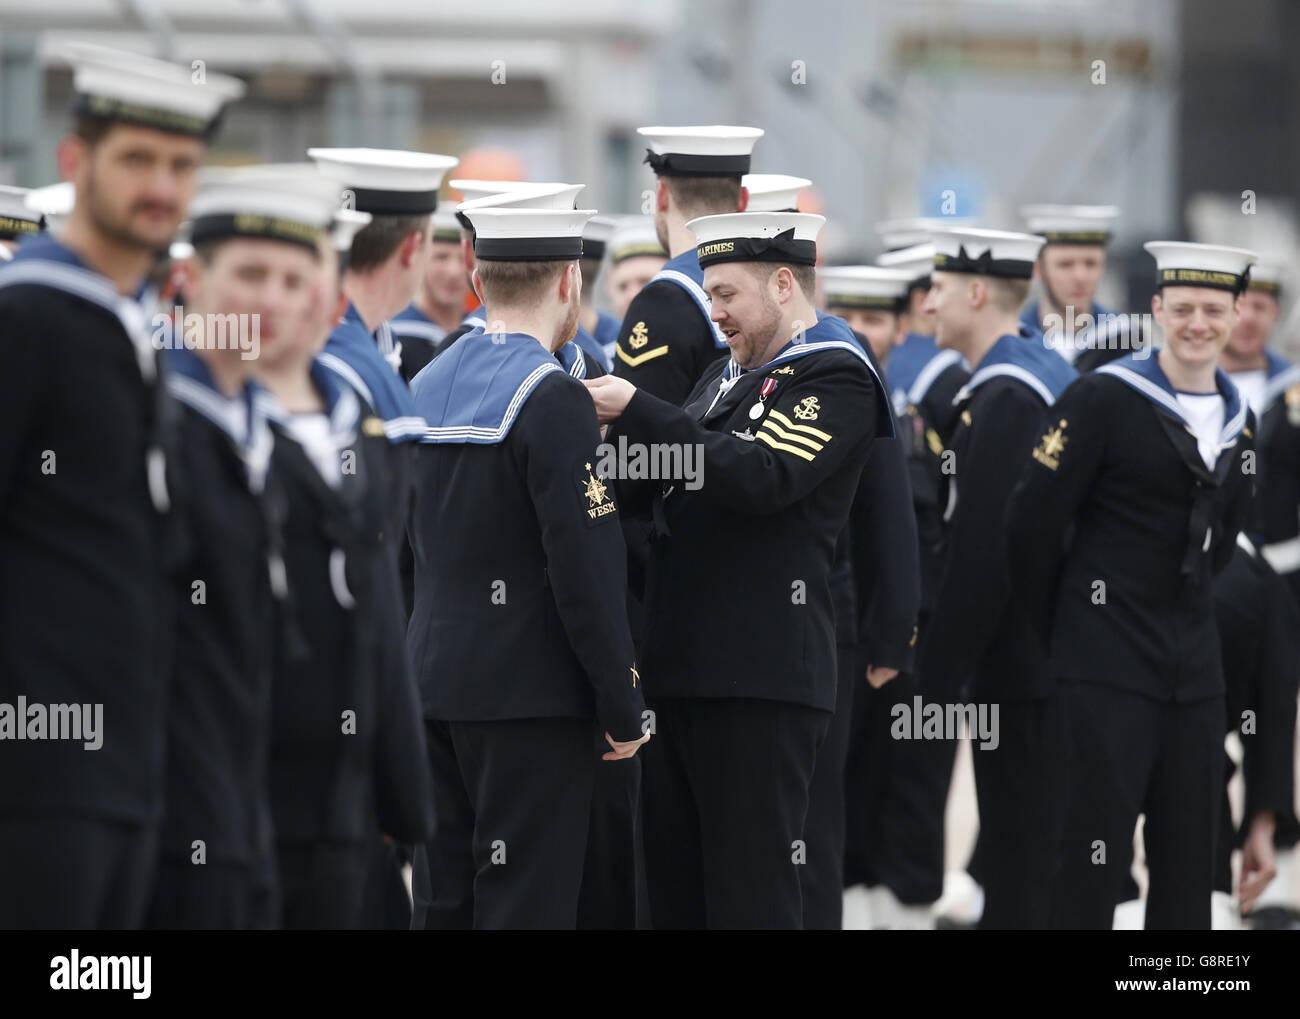 Attack submarine HMS Artful - Stock Image